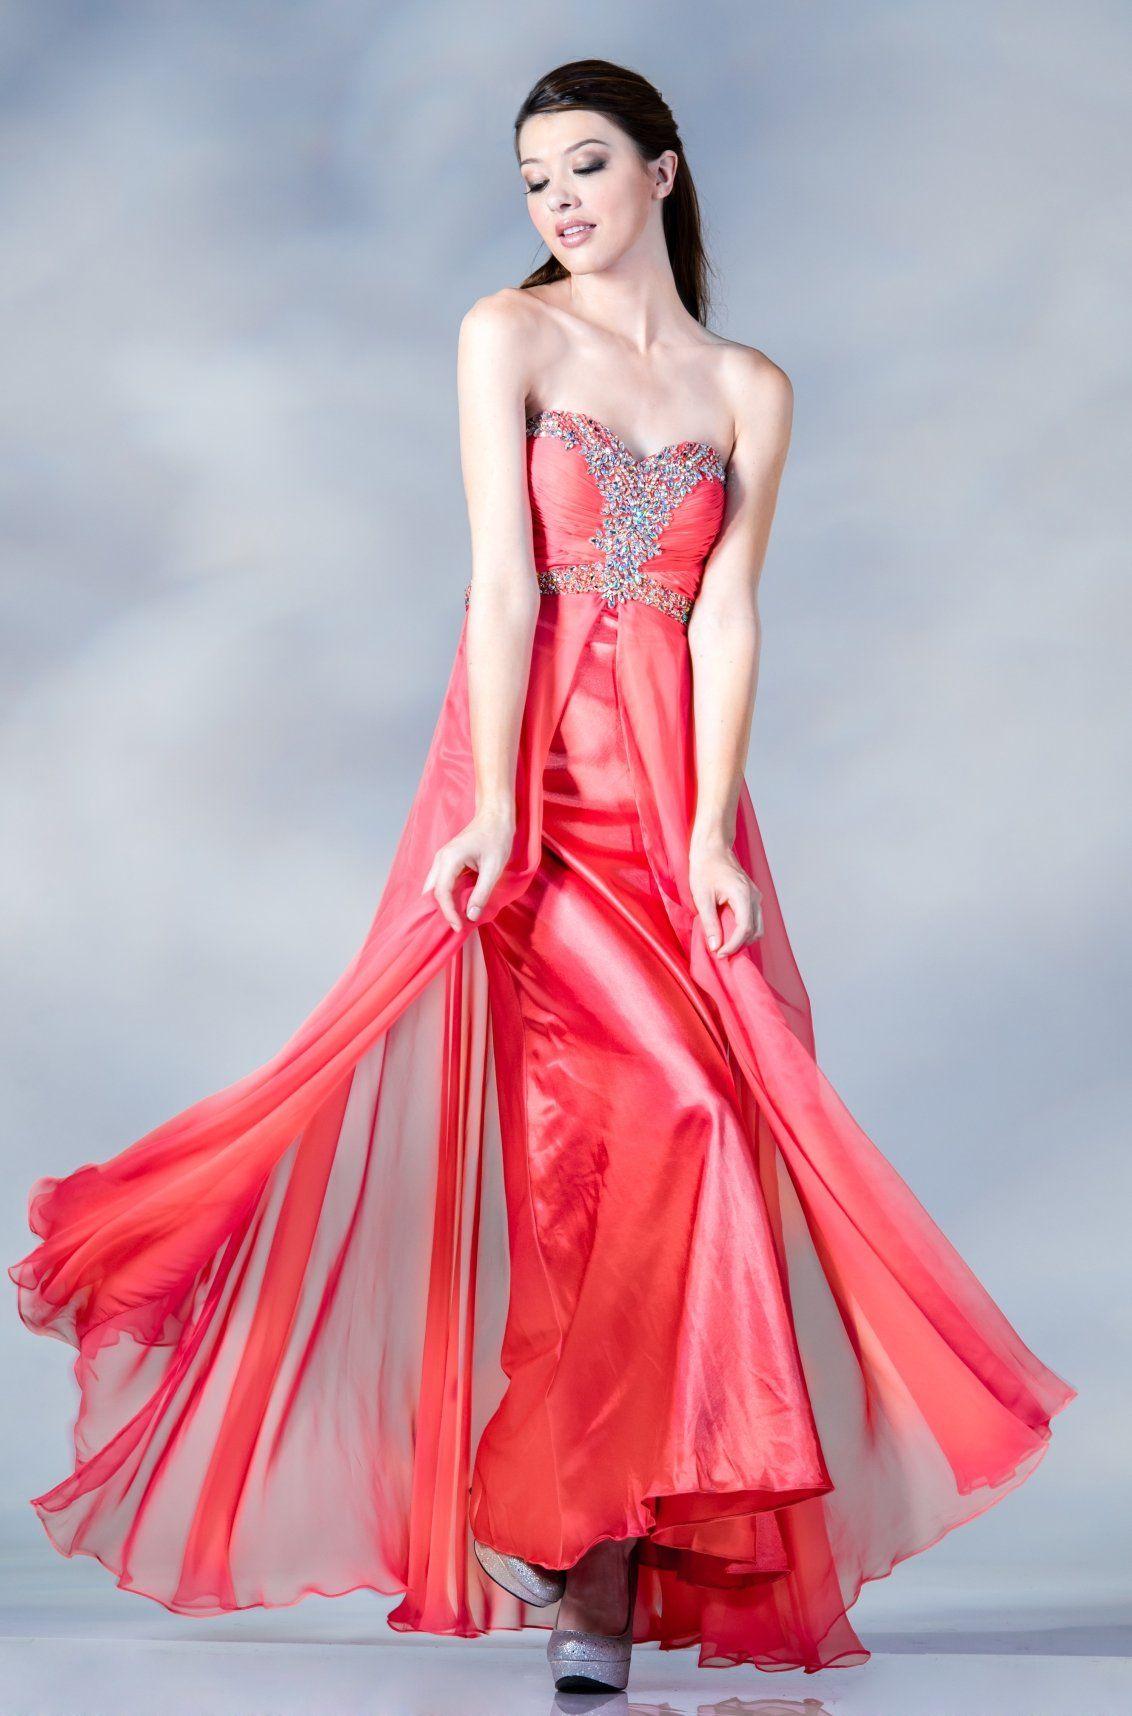 CLEARANCE - Empire Waist Coral Chiffon Flowy Dress Empire Waist ...